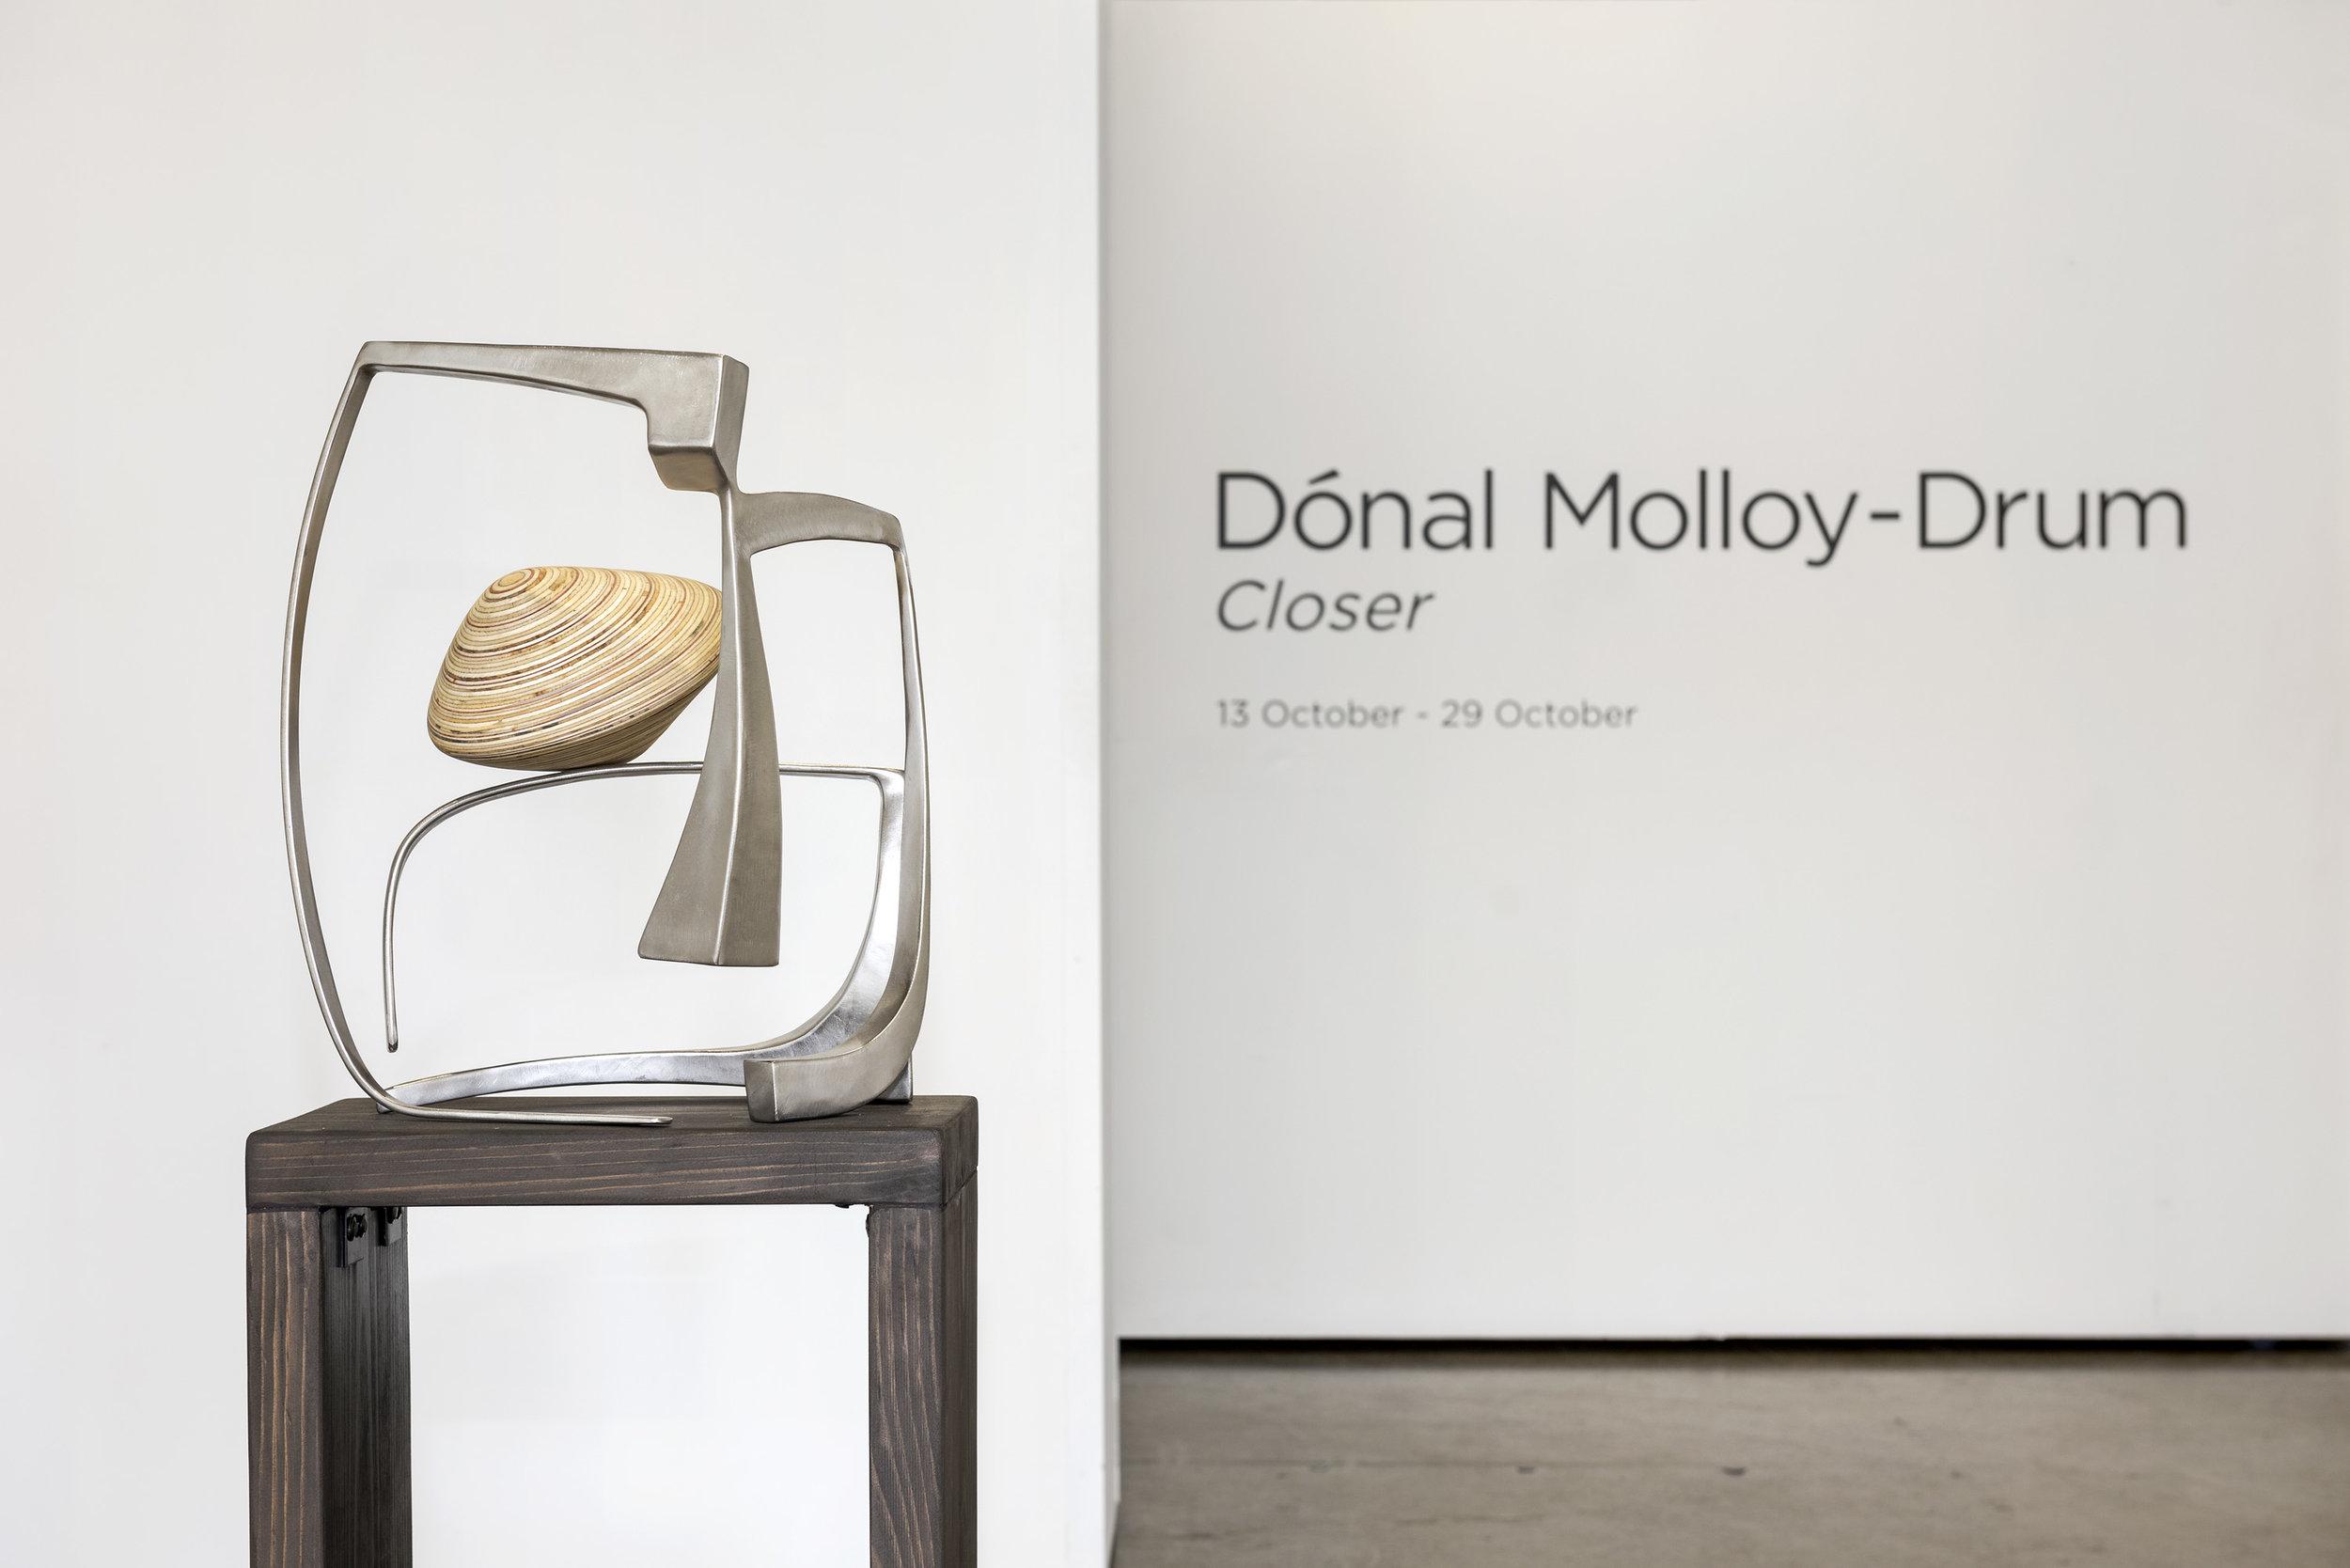 Fehily_DónalMolloy-Drum_Install_001 (1).jpg